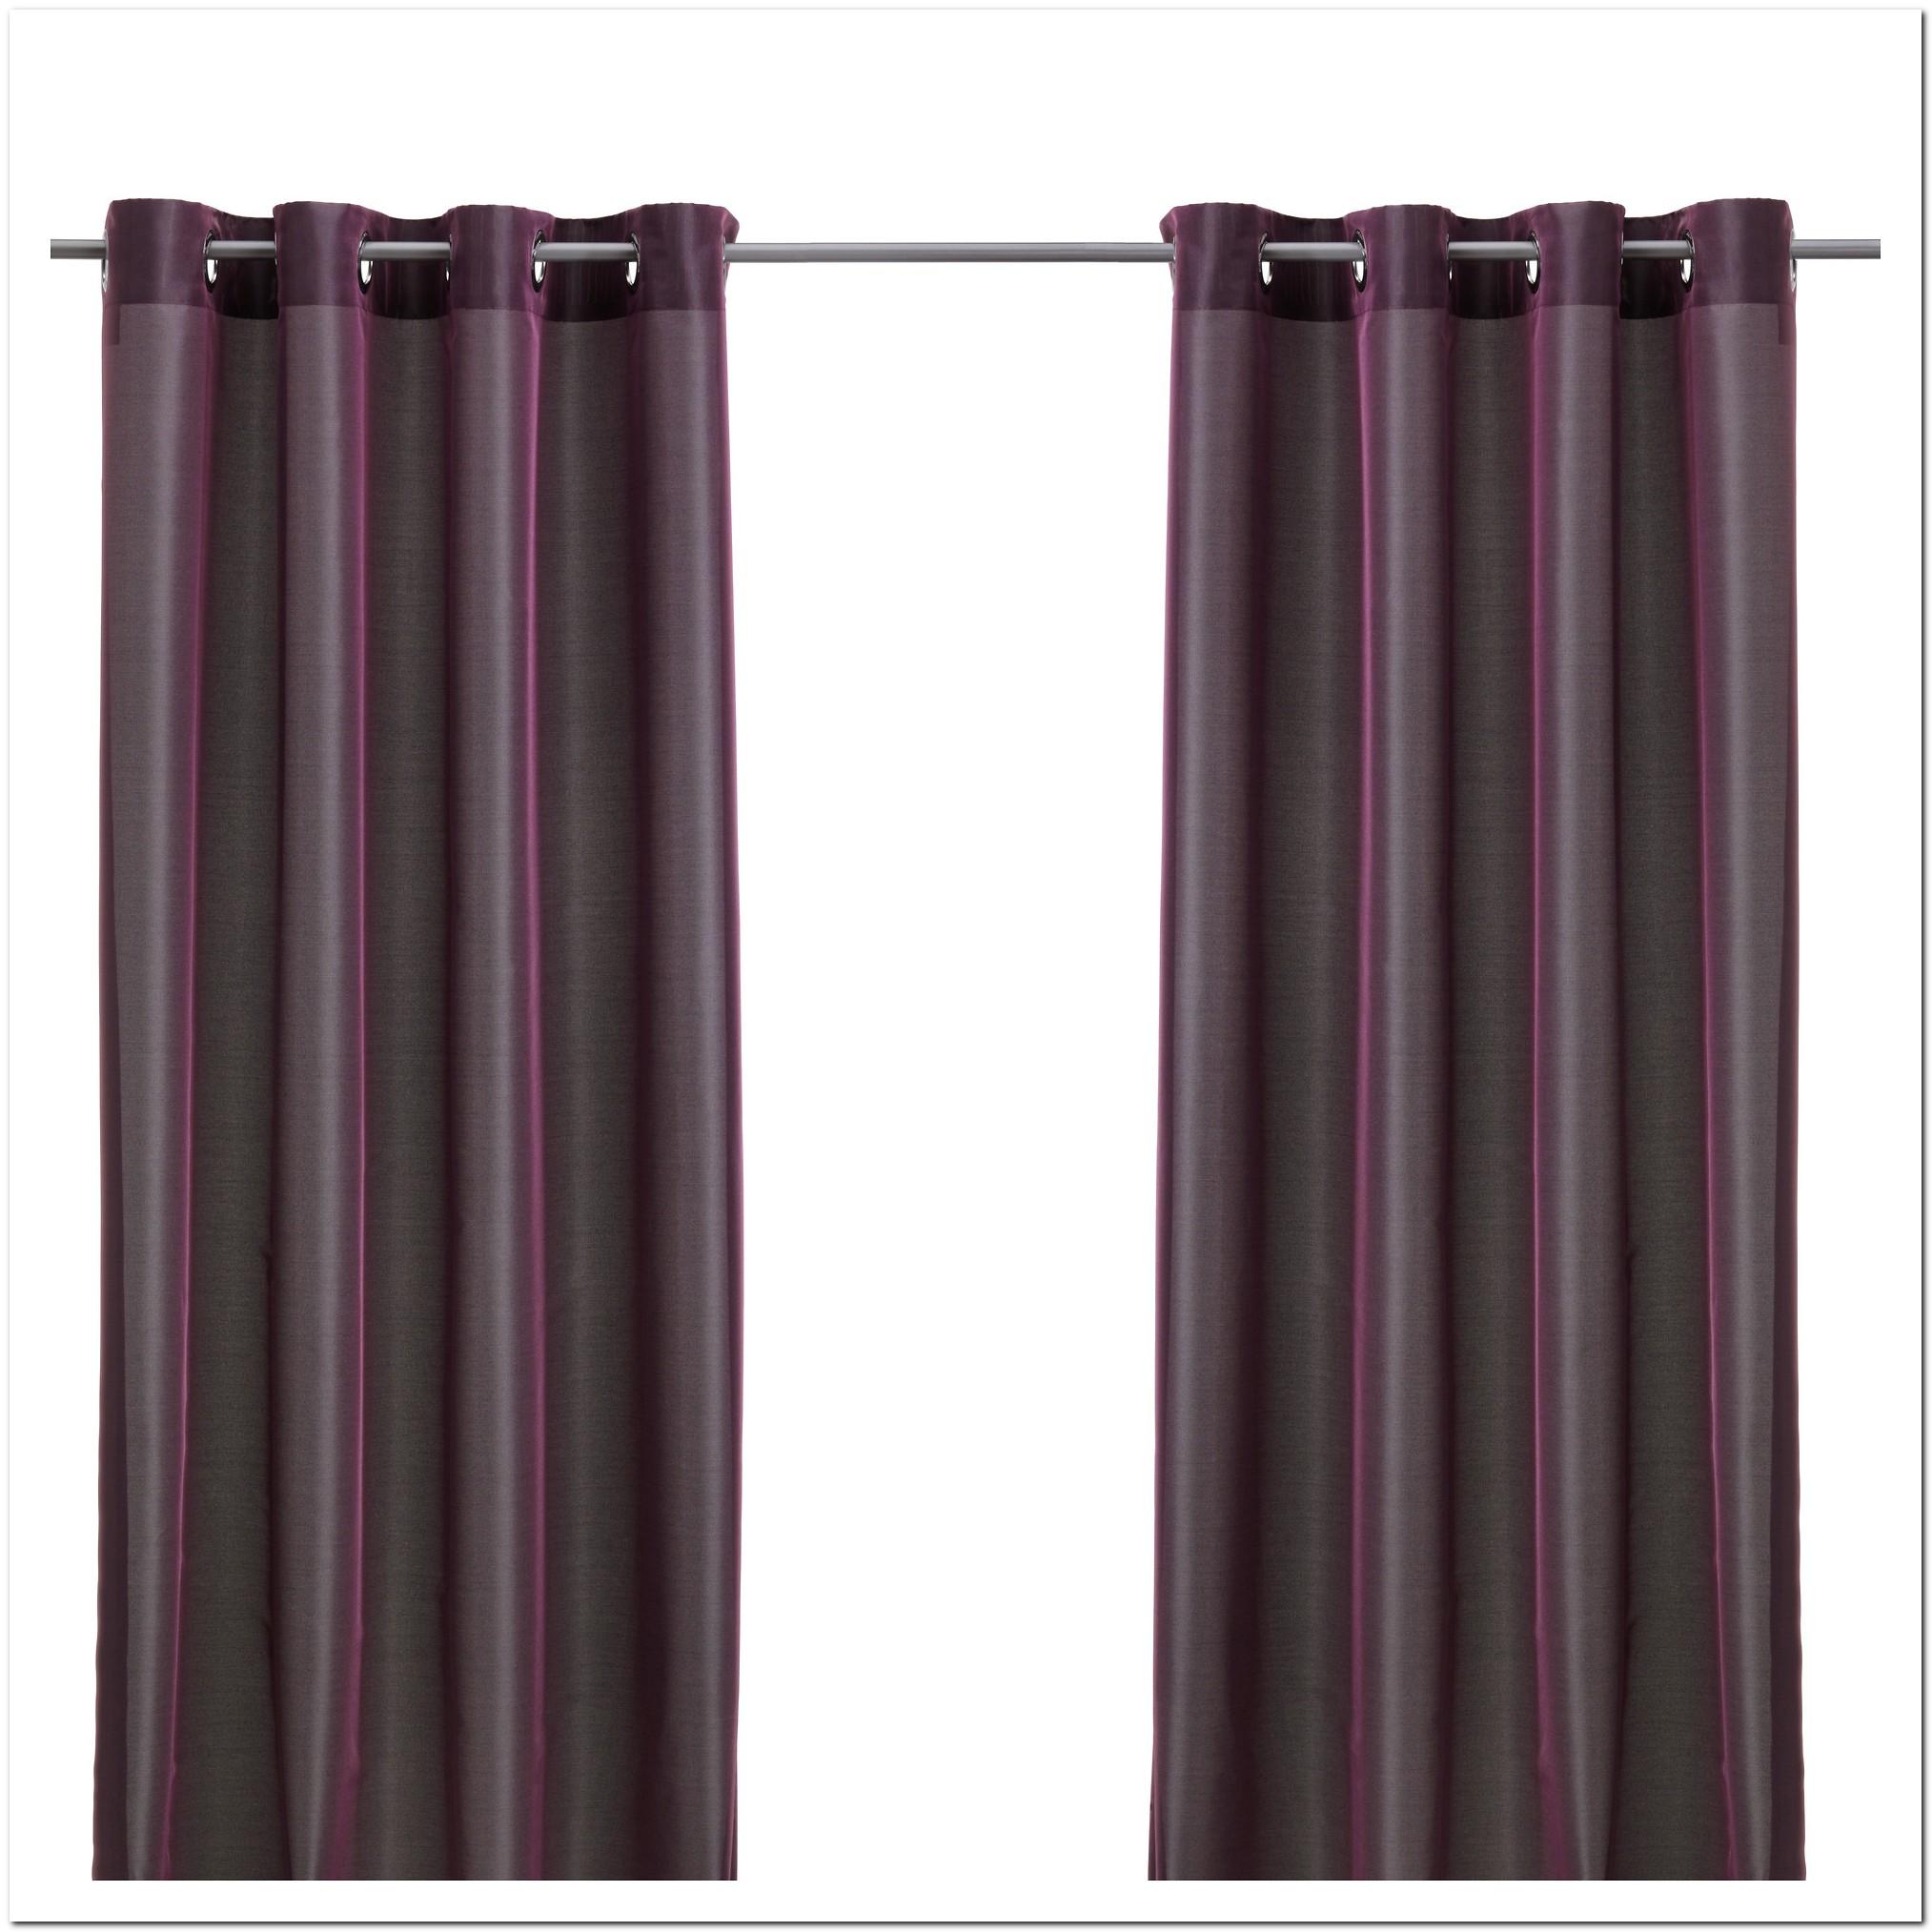 Double Rideaux Velours Ikea